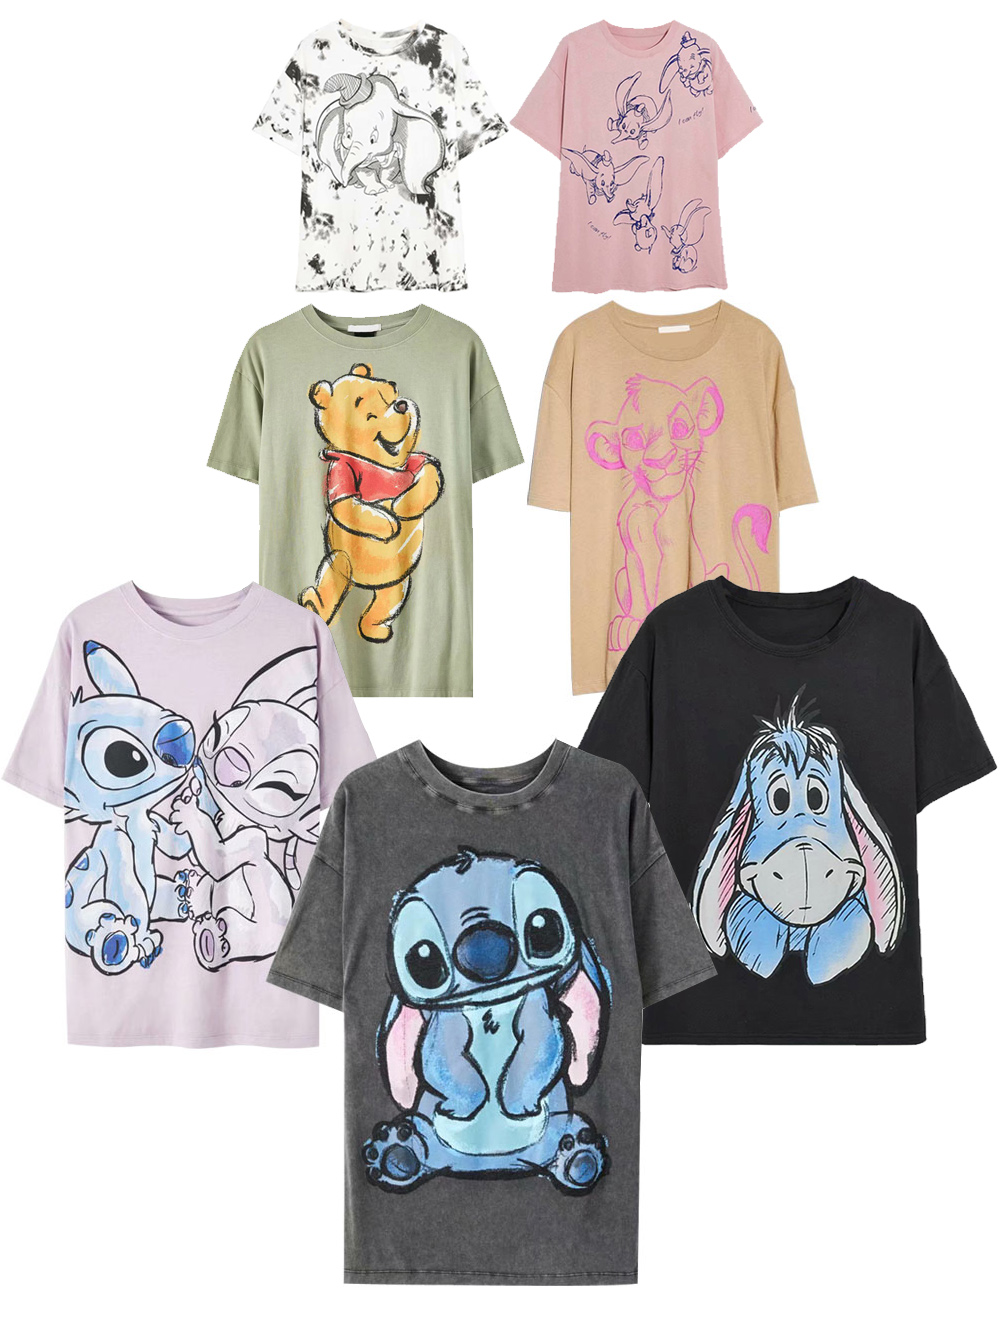 T-Shirt Tee-Tops Stitch SIMBA Mickey Mouse Fairy Pooh Winnie Family Cartoon Print Cotton